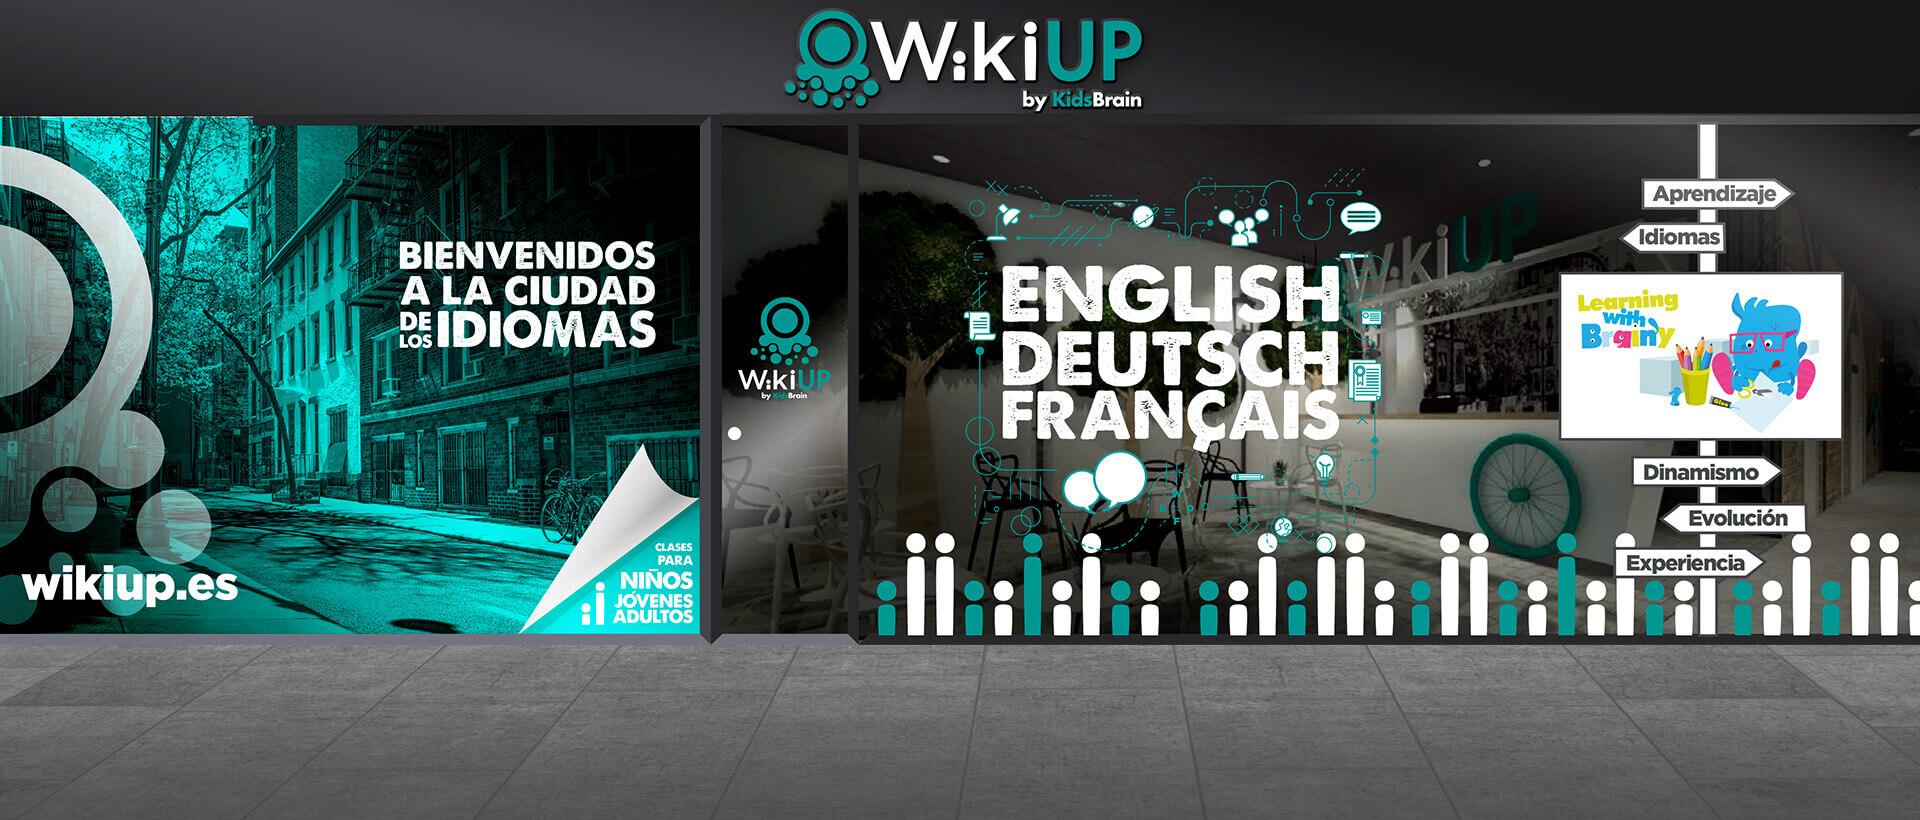 Franquicia WikiUP idiomas